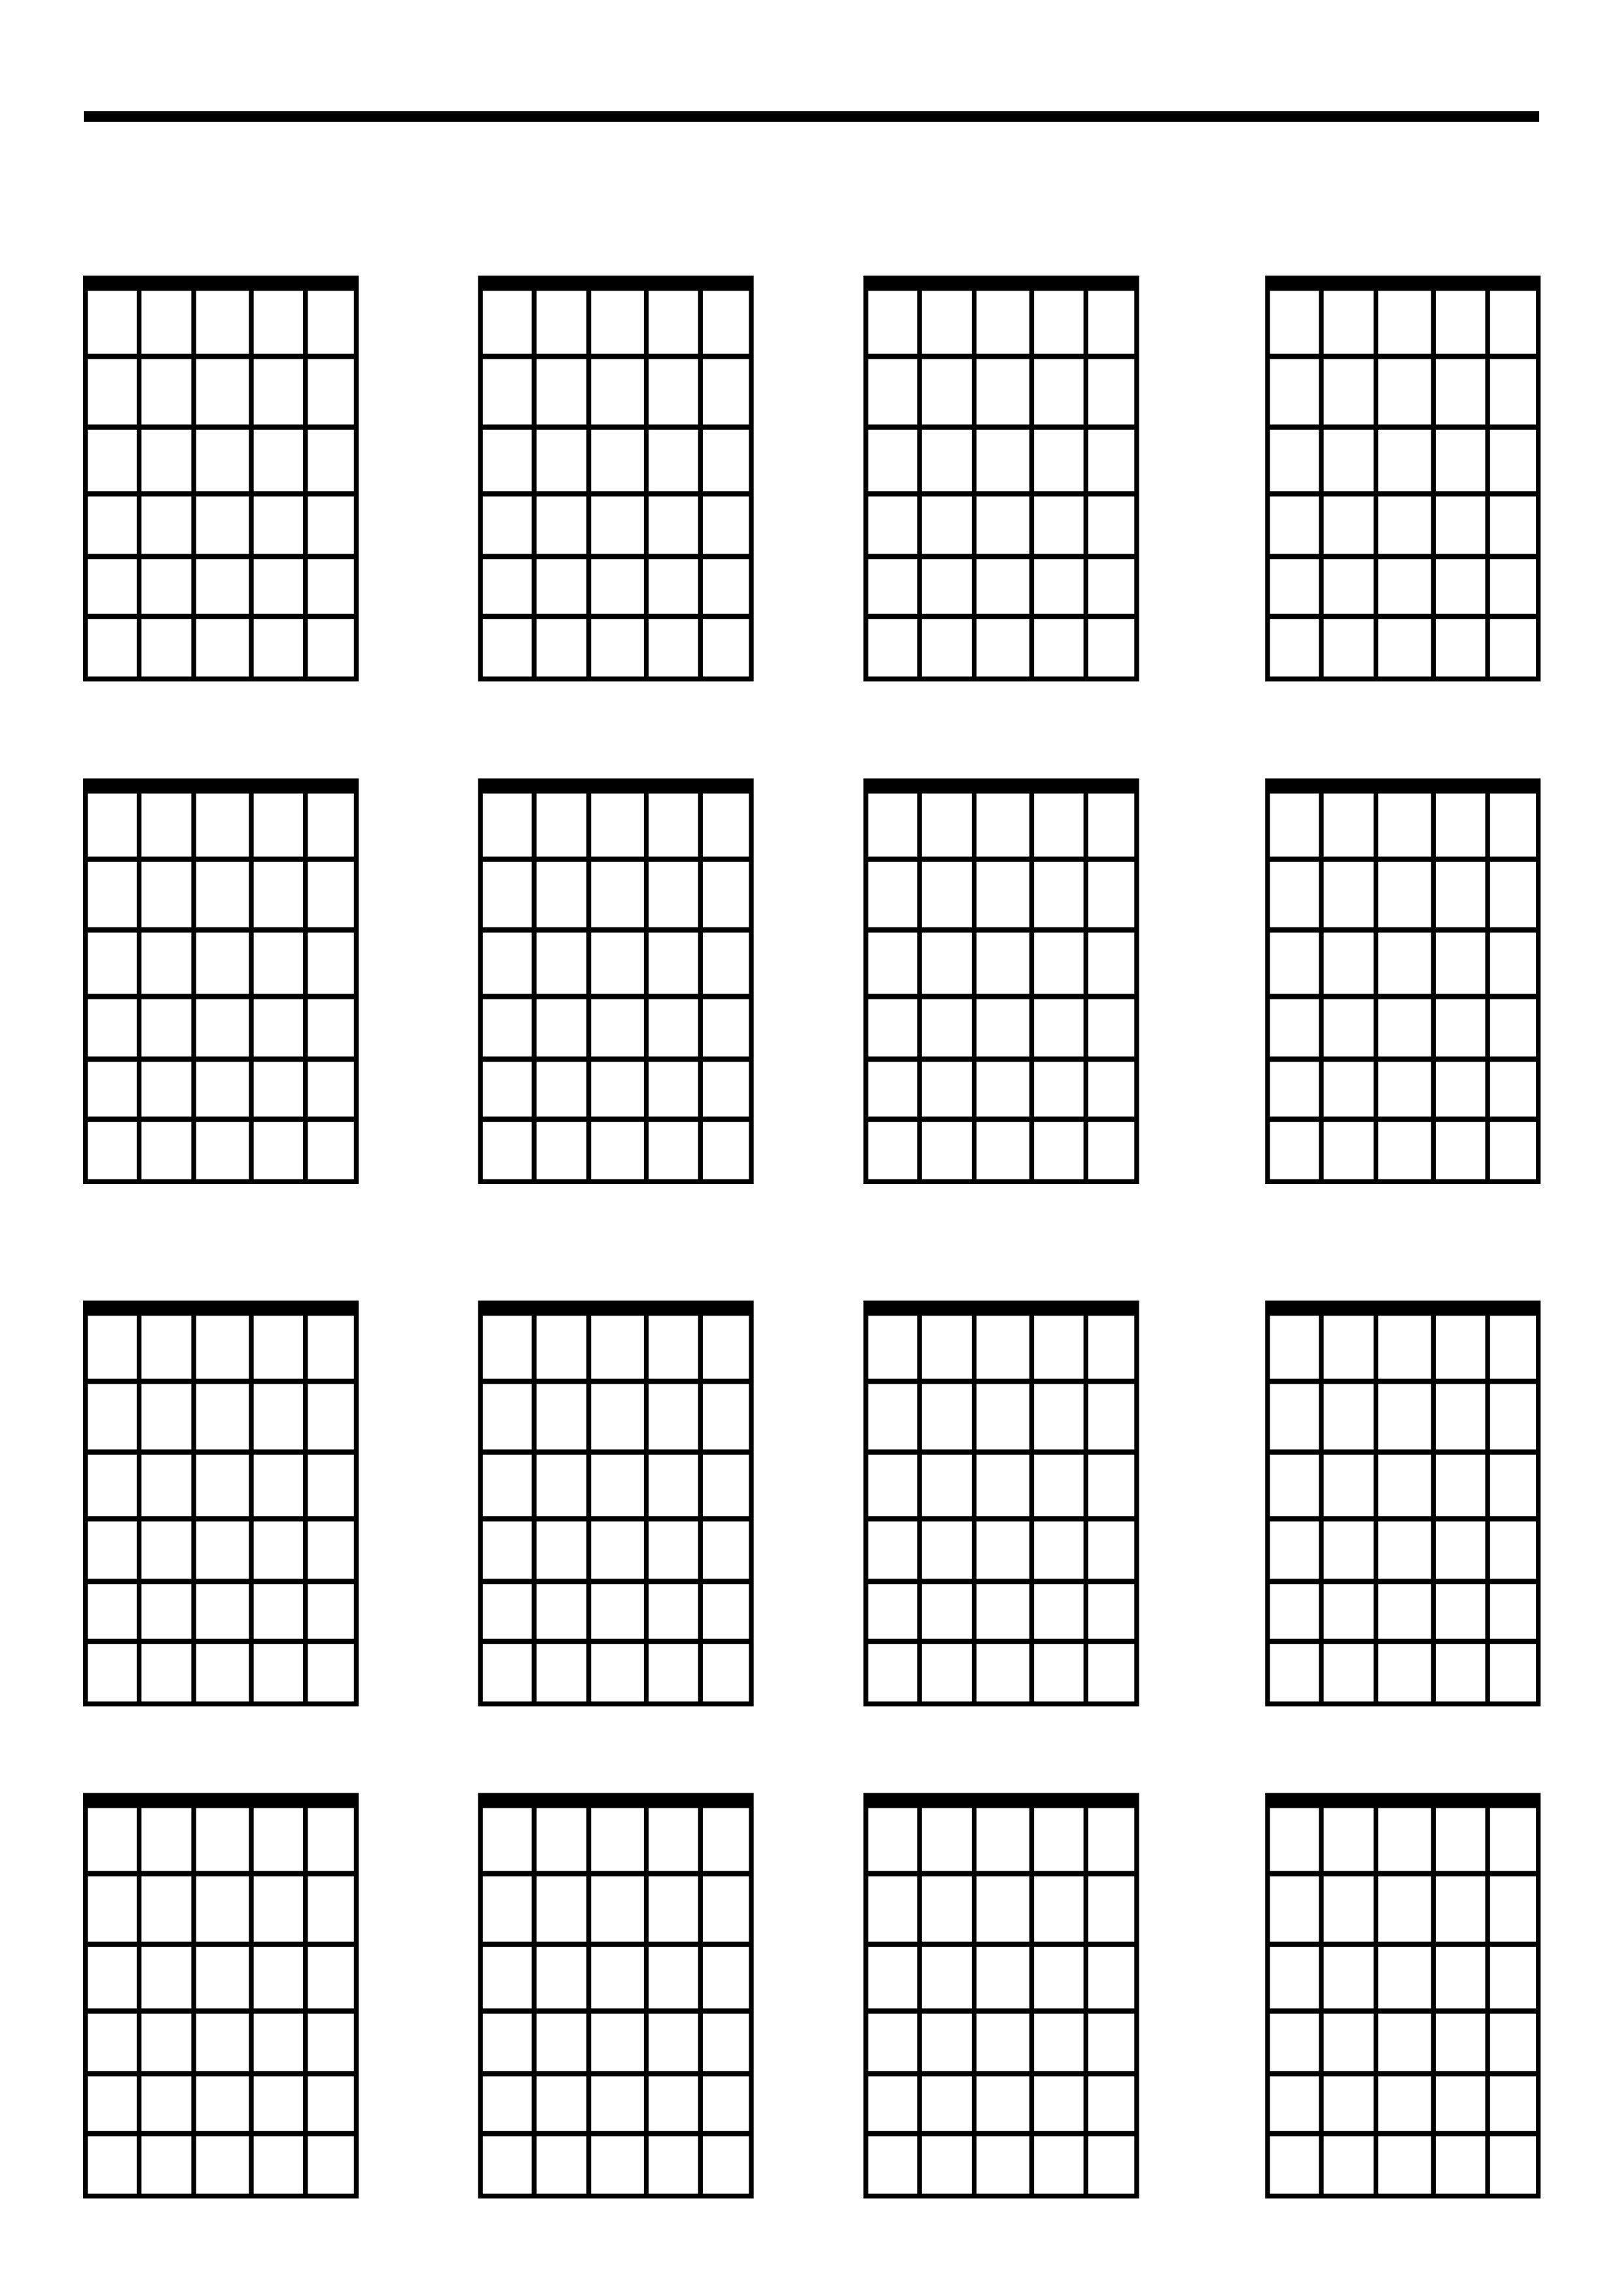 Blank Guitar Chord Sheet Steveforward Free Line Guitar Lessons